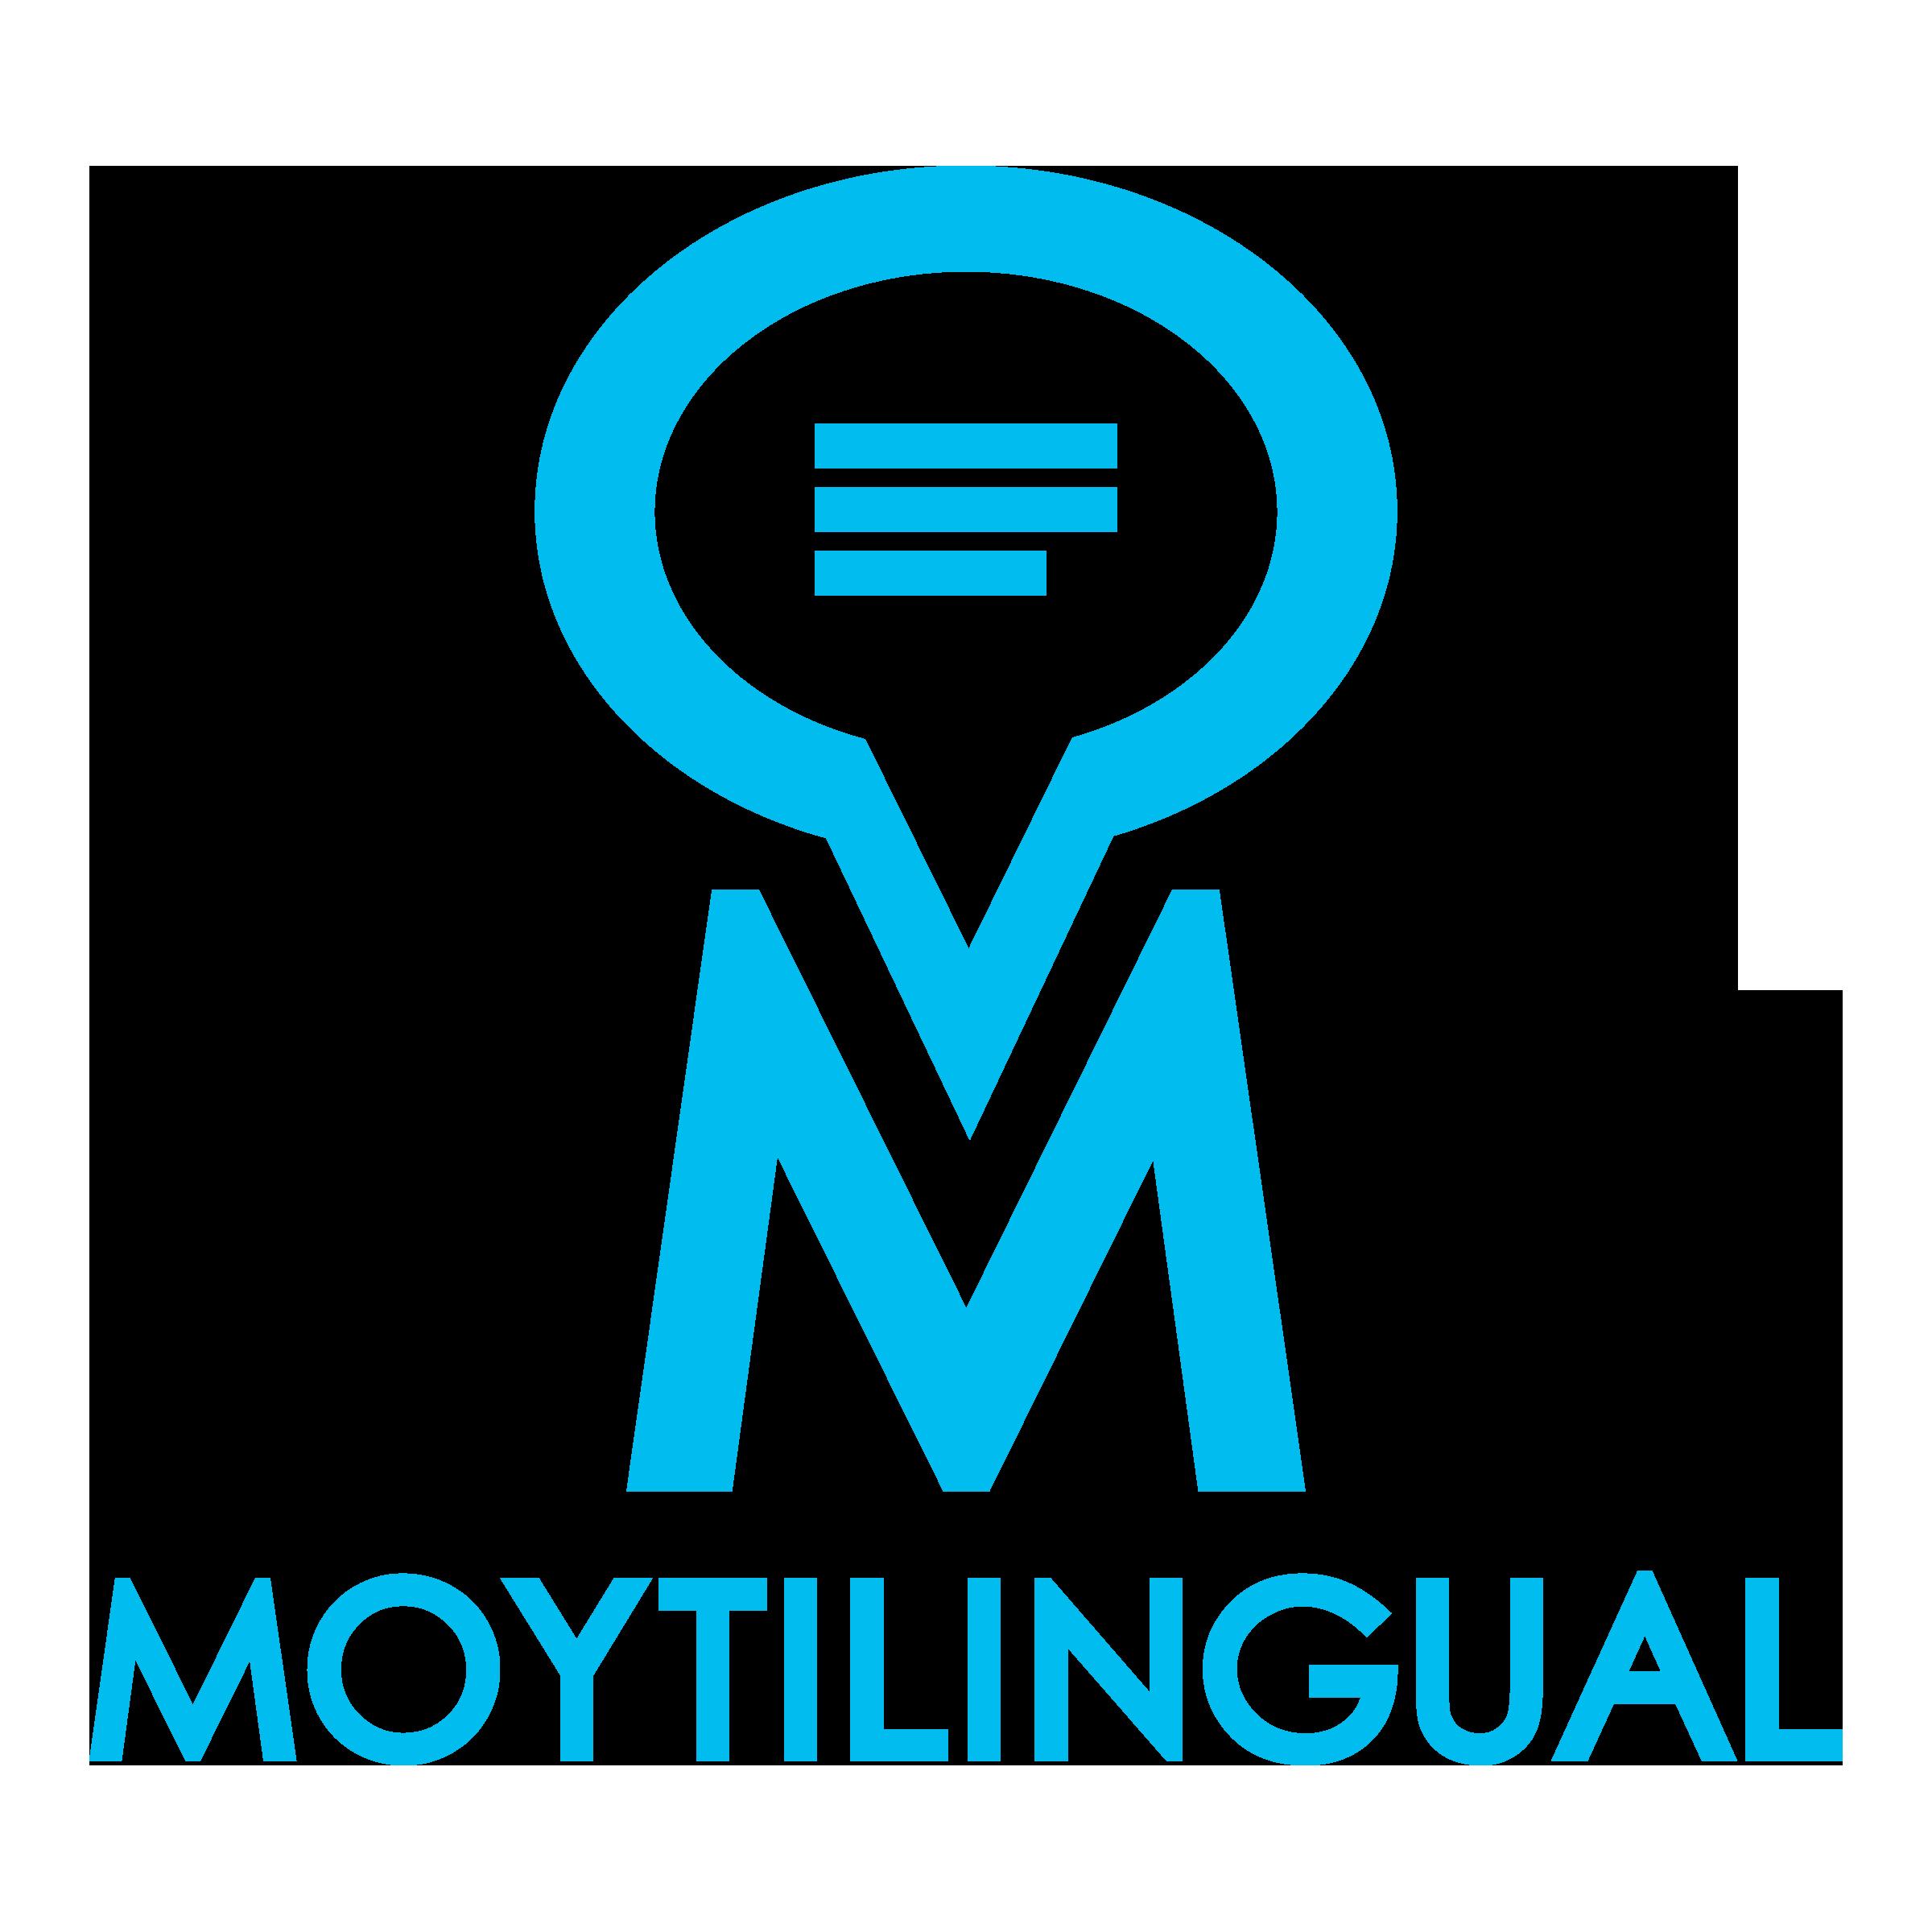 Moytilingual-v2-rgb.png